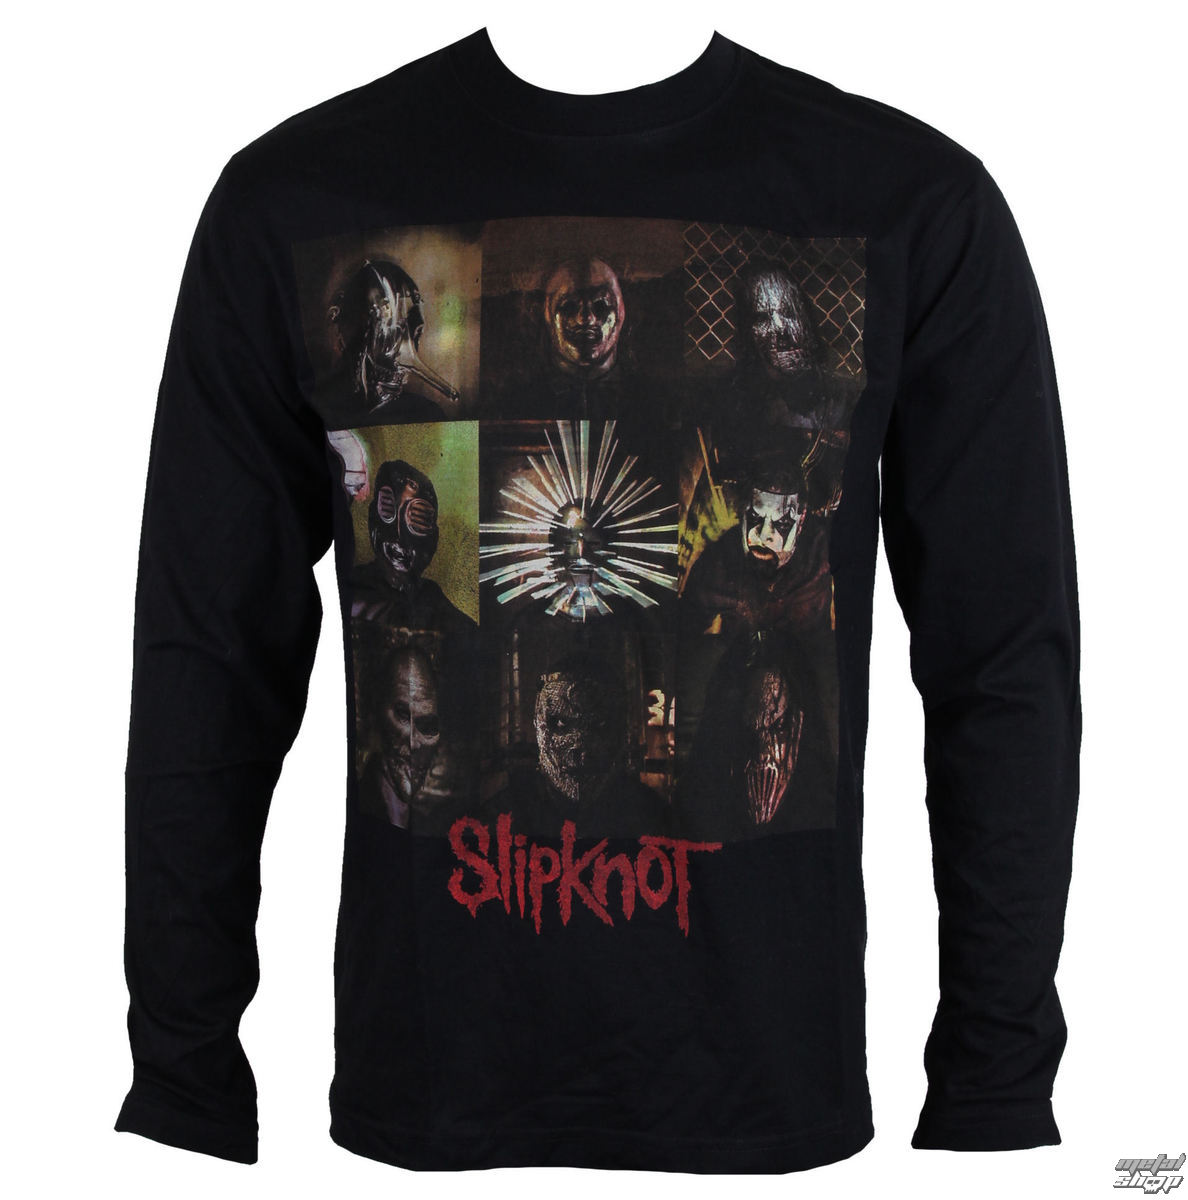 d5625eab90c tričko pánské s dlouhým rukávem Slipknot - Blocks - ROCK OFF ...